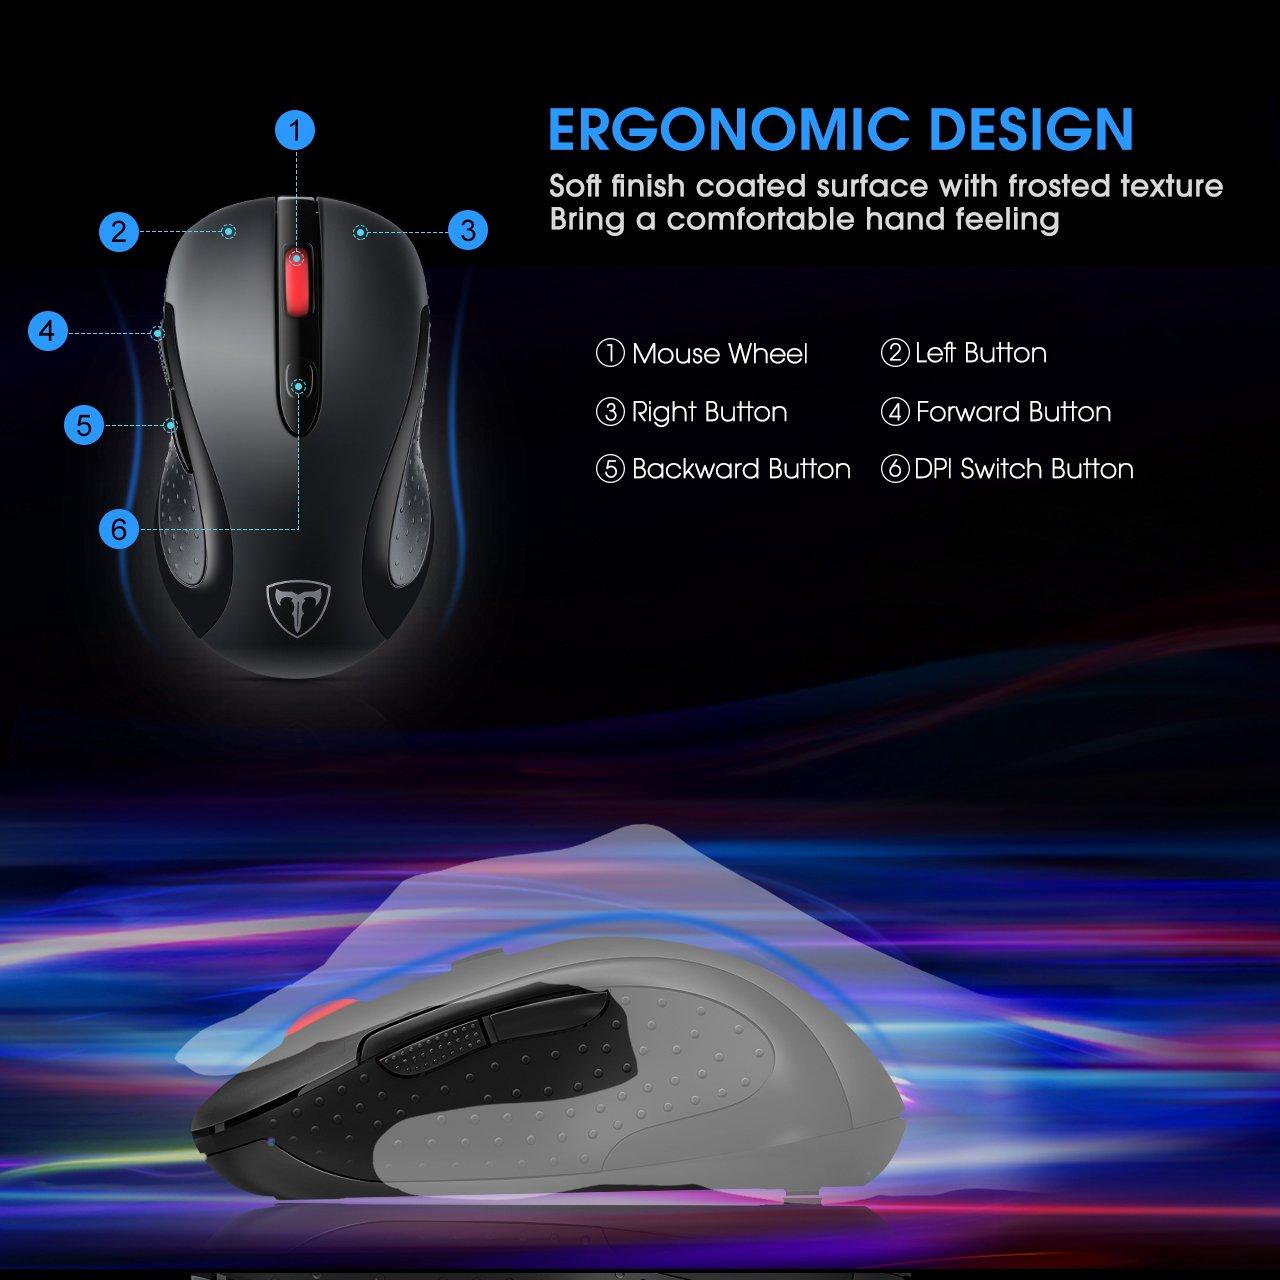 Xintop 2.4G Ratón Inalámbrico Ergonómico con Nano Receptor, 6 Botones Laterales Personalizadas, 5 DPI Ajustable 800-1200-1600-2000-2400, Modo de Dormir para ...